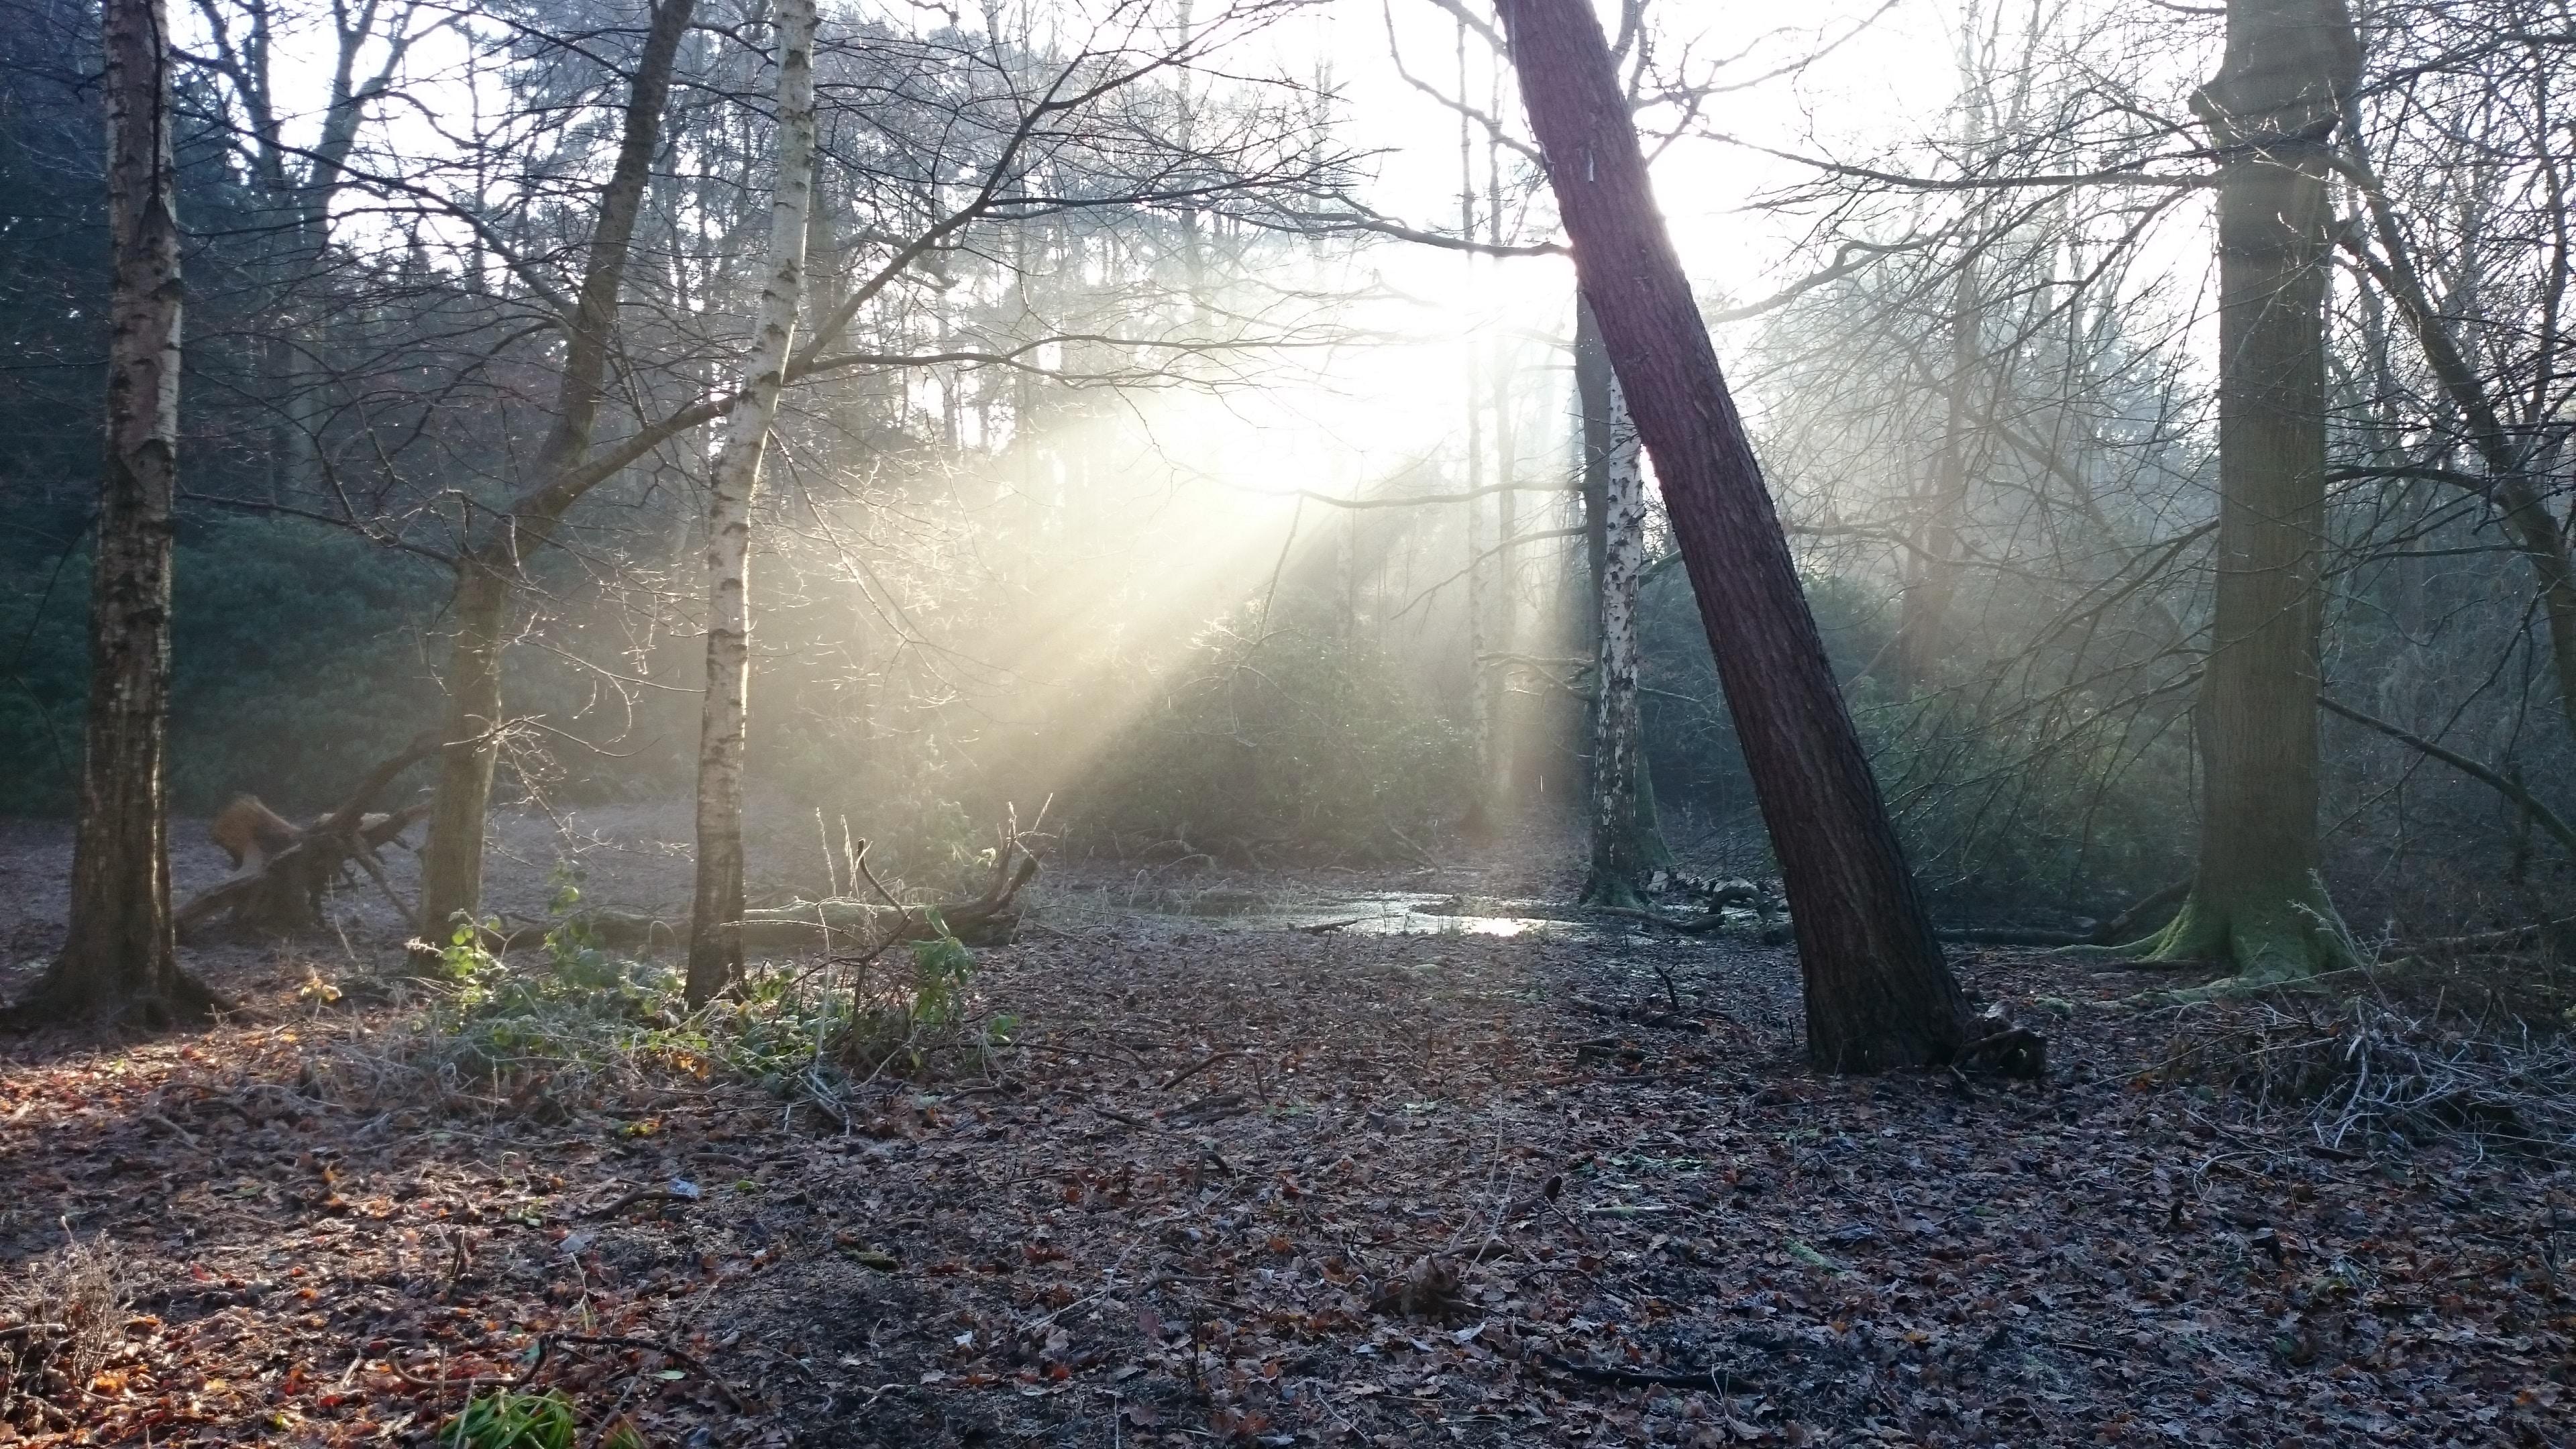 Sun beams shine on a leafy forest field